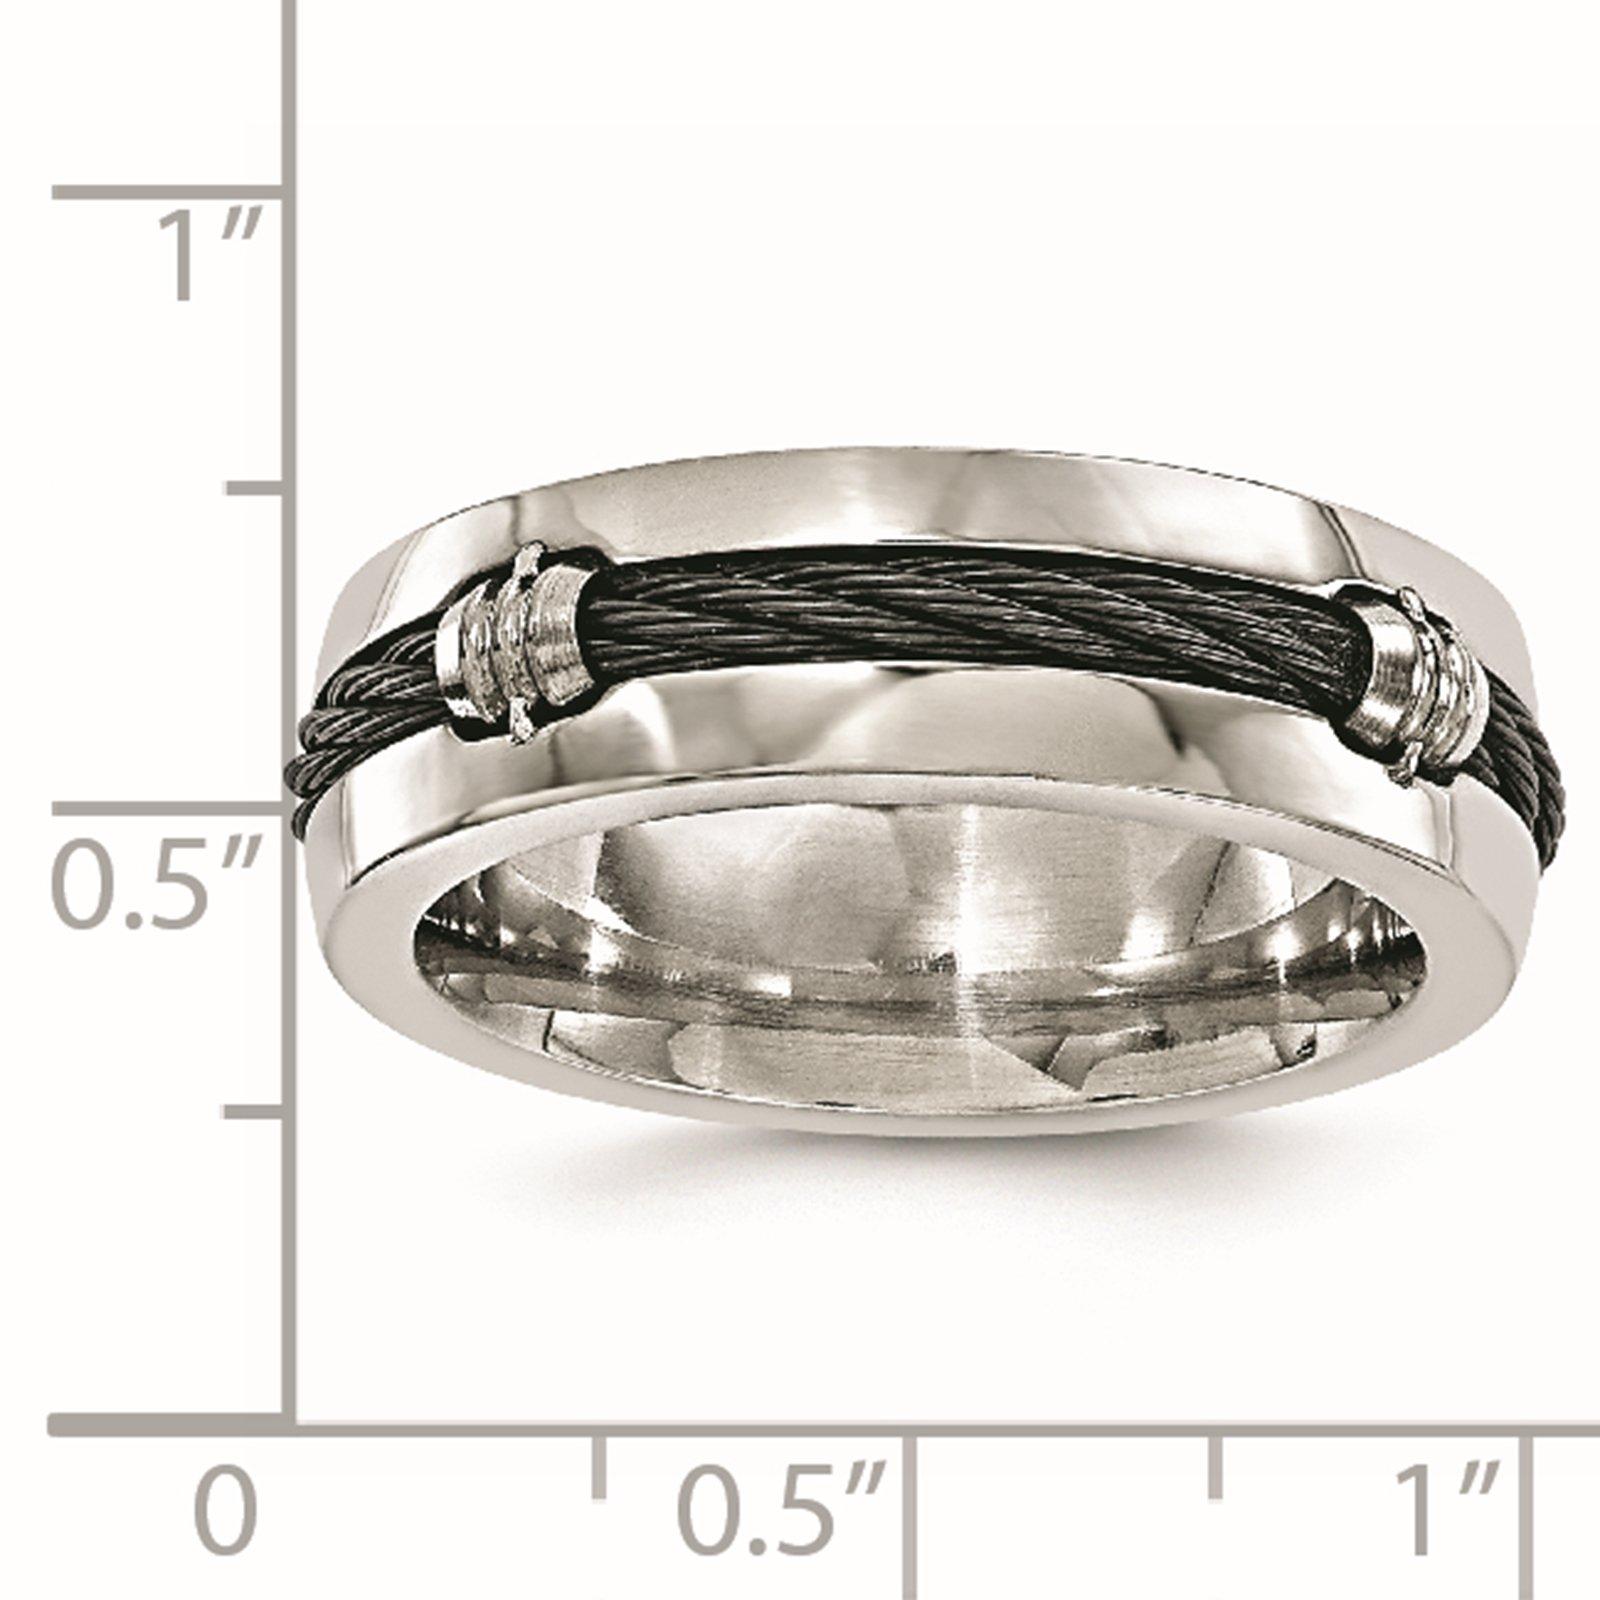 Titanium & Cable Polished 7mm Wedding Ring Band Size 8 by Edward Mirell by Venture Edward Mirell Titanium Bands (Image #5)